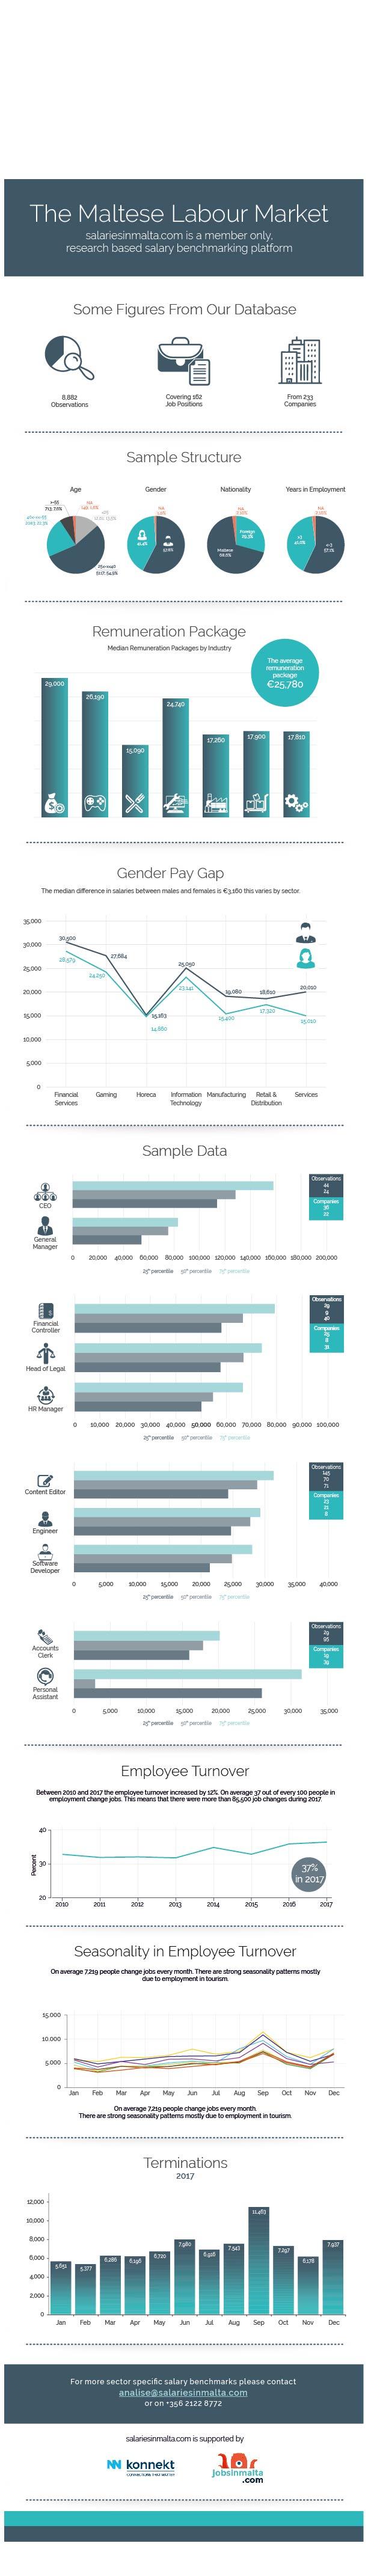 https://simpublic.s3.eu-central-1.amazonaws.com/Infographic-the-maltese-labour-market.jpg